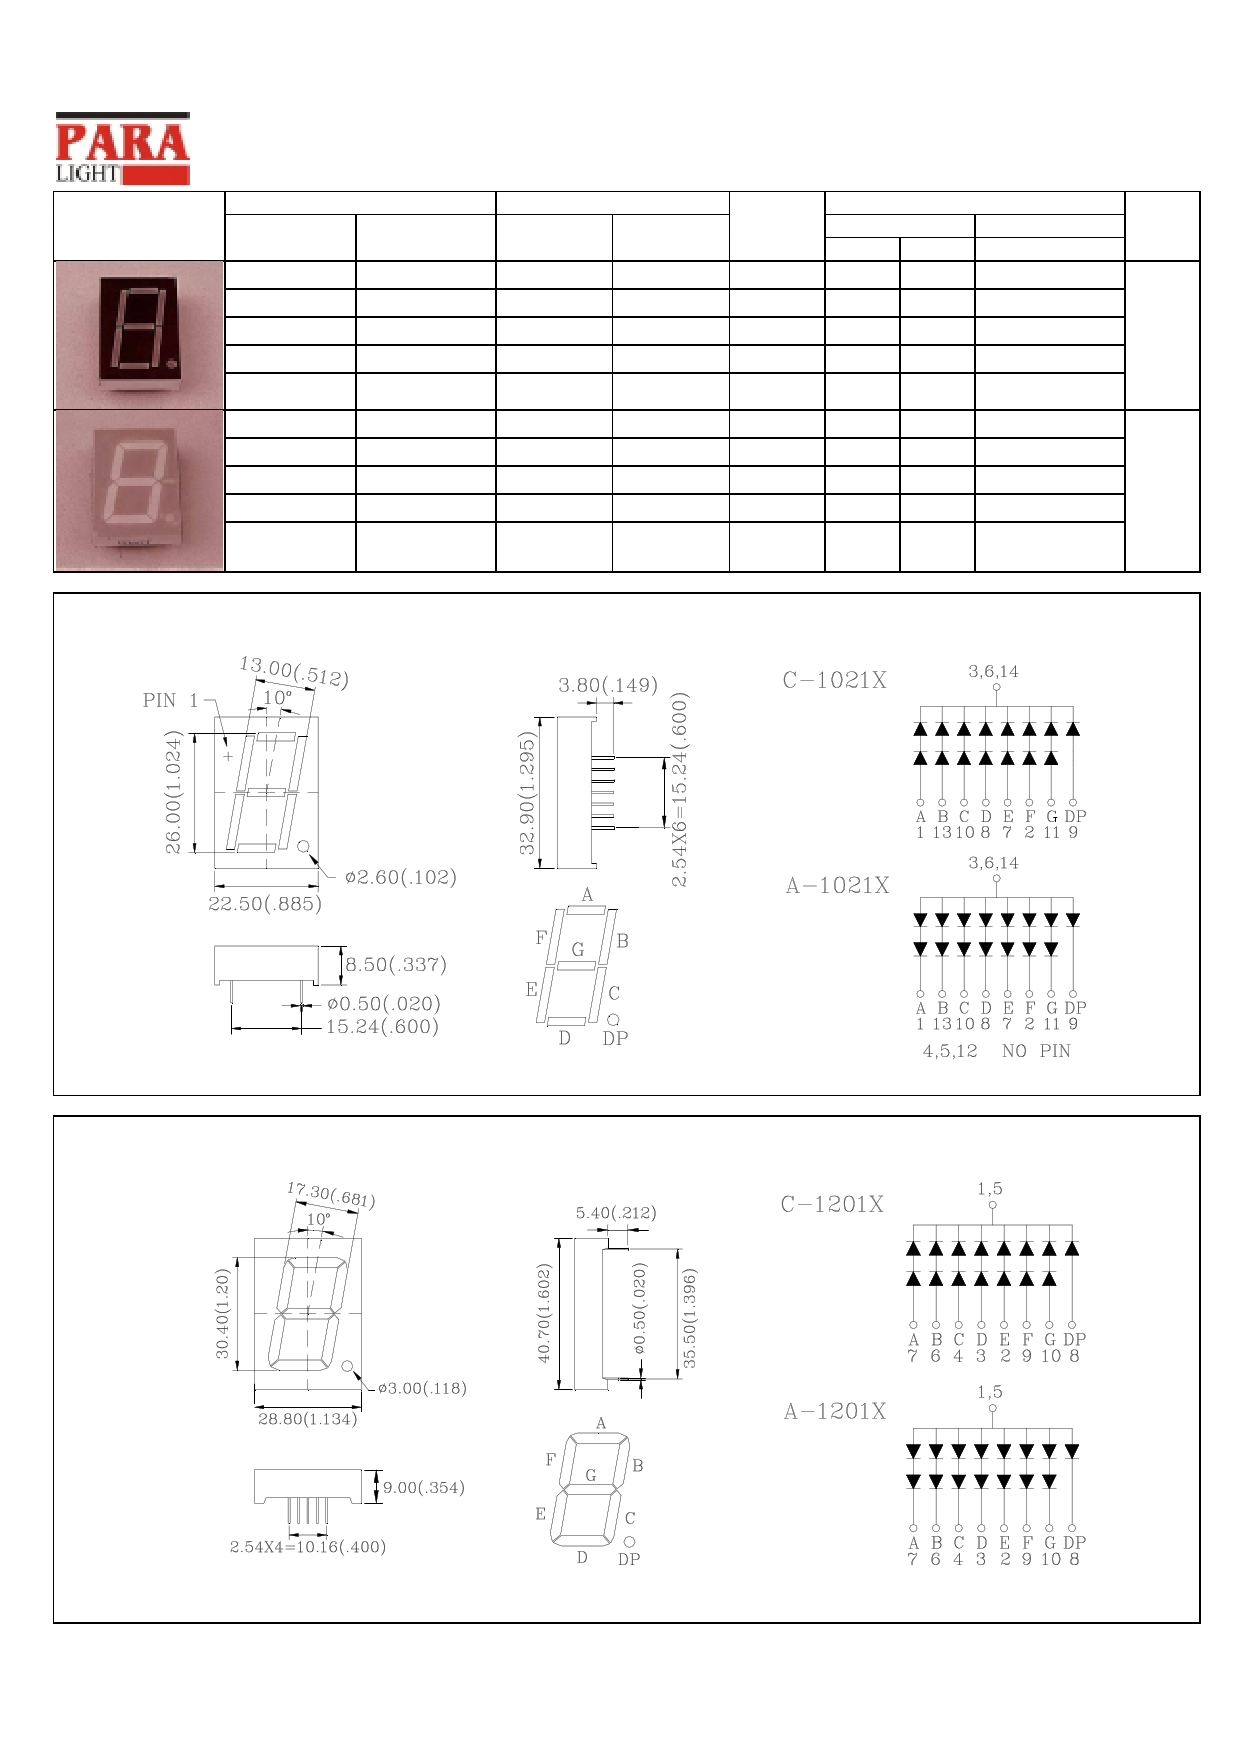 C-1201X 데이터시트 및 C-1201X PDF